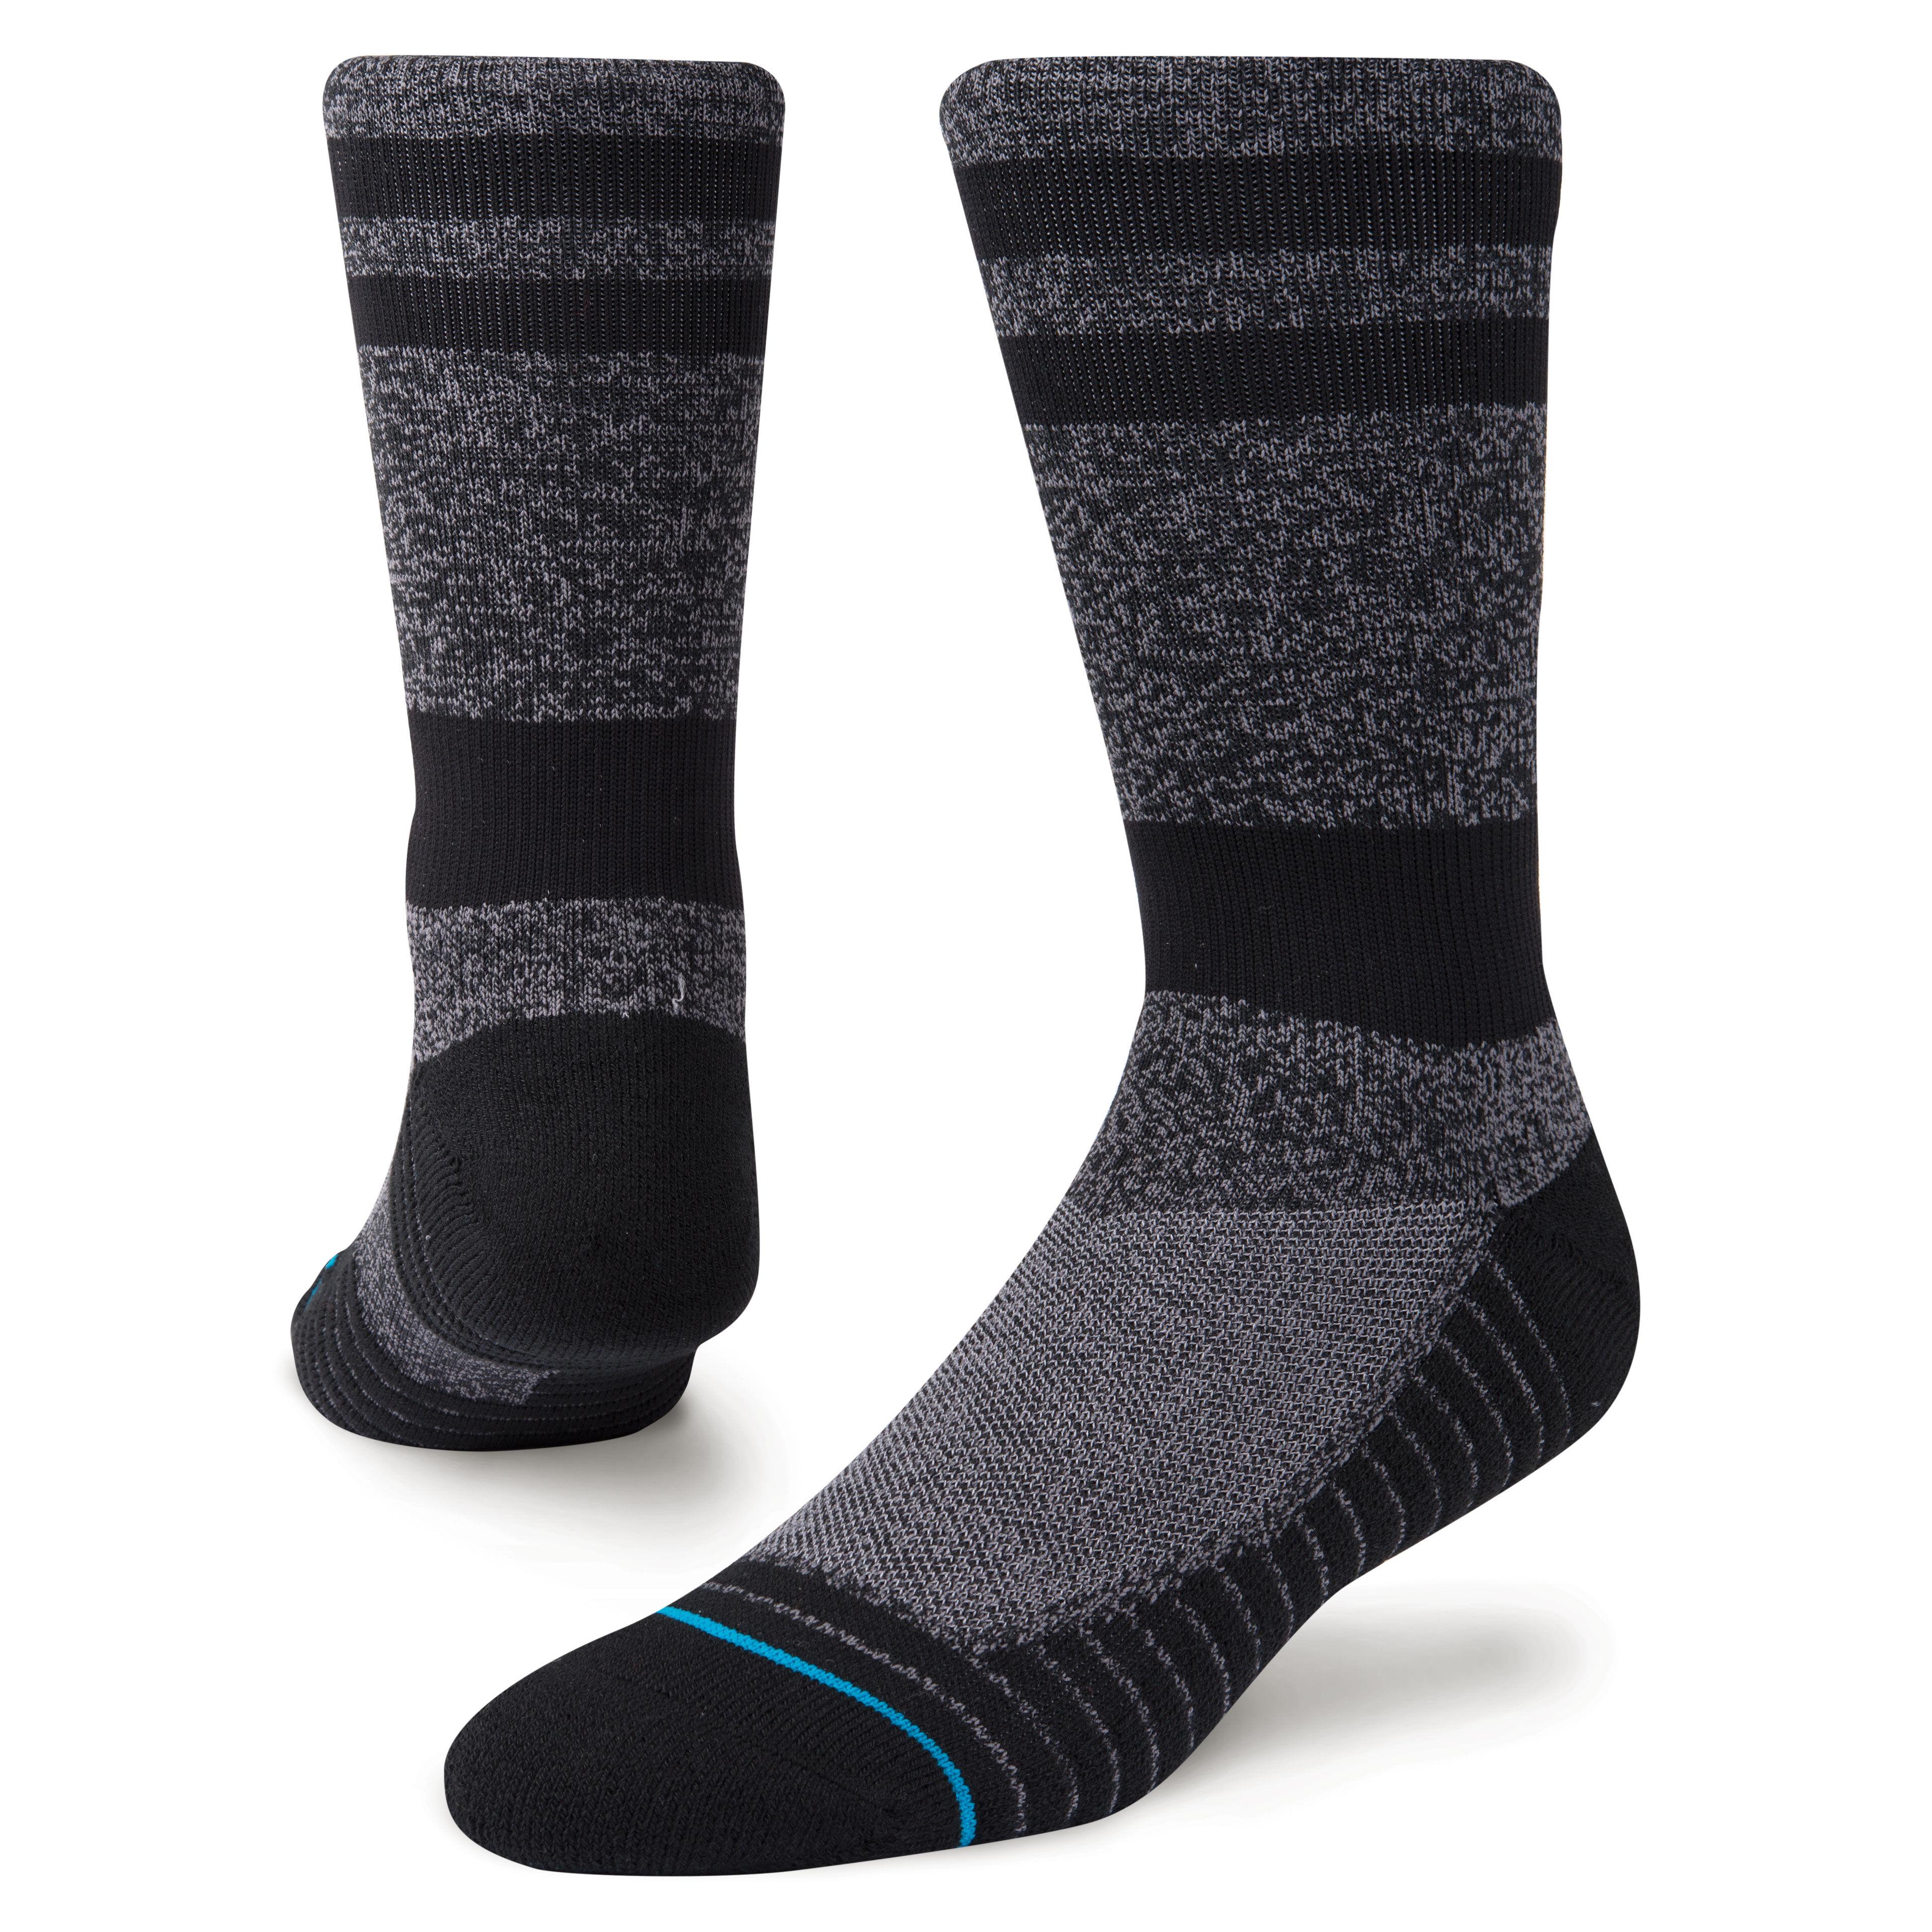 stance performance socks